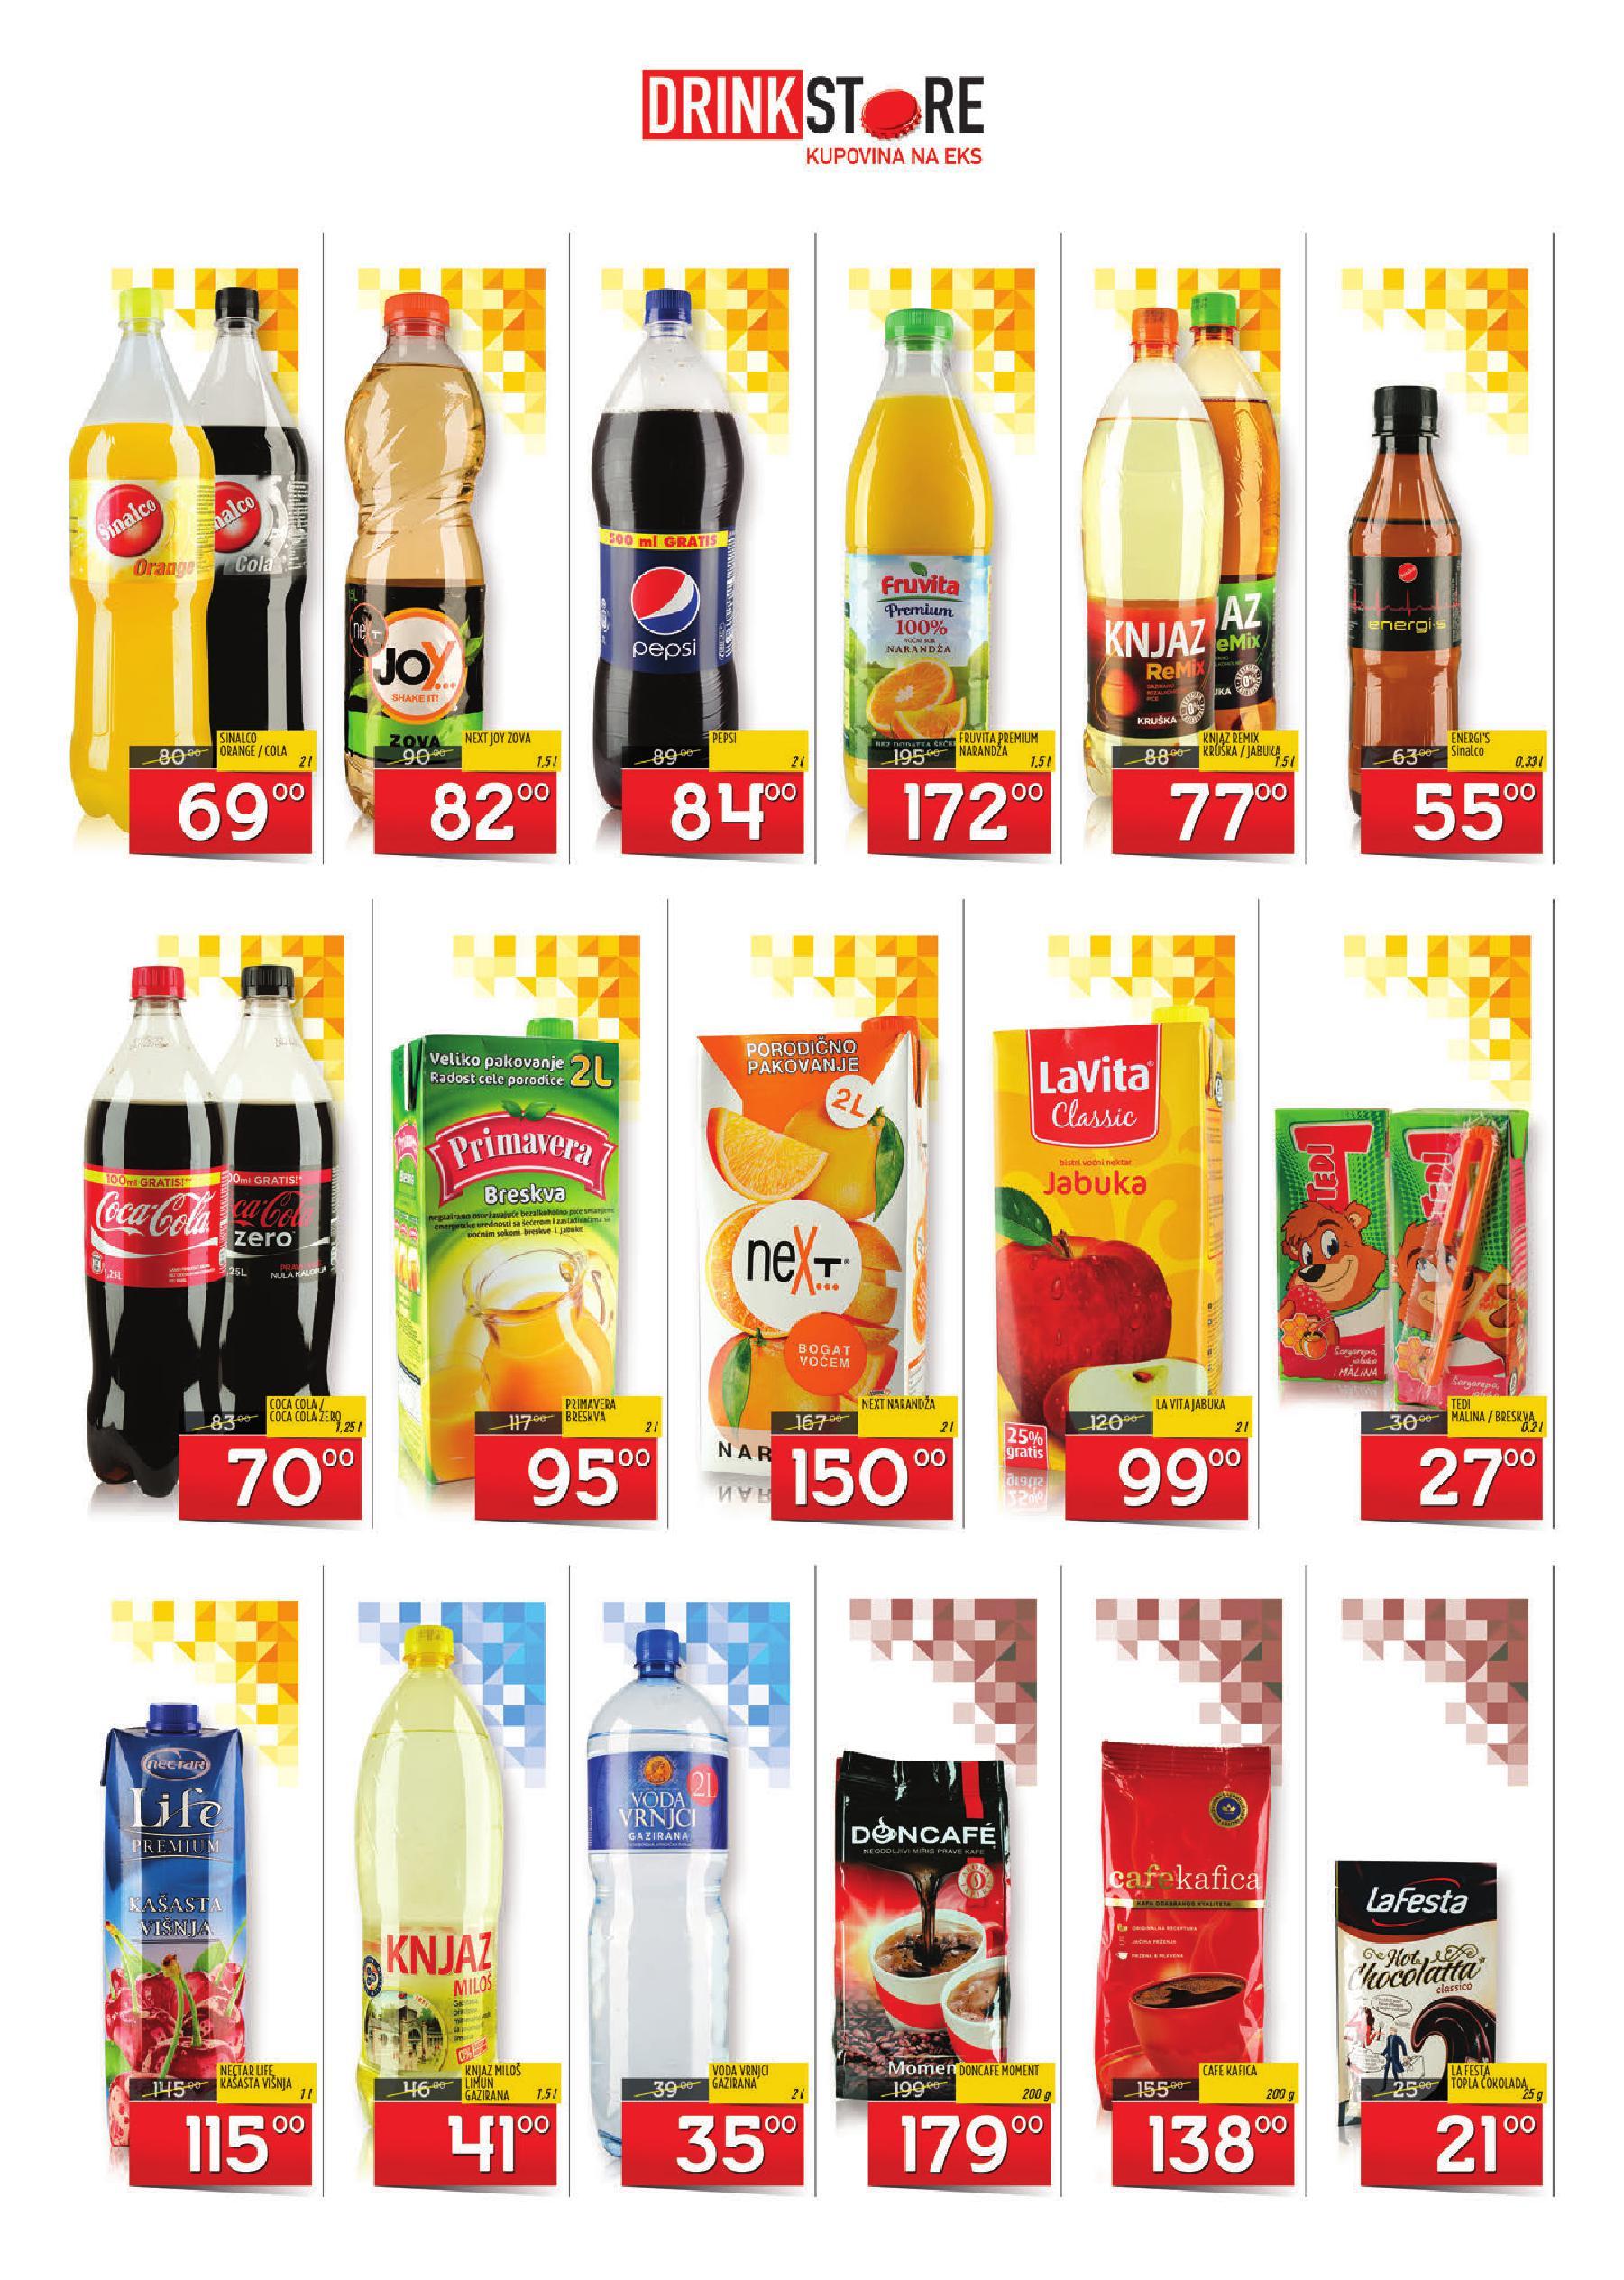 Drink Store akcija mesec super ponude